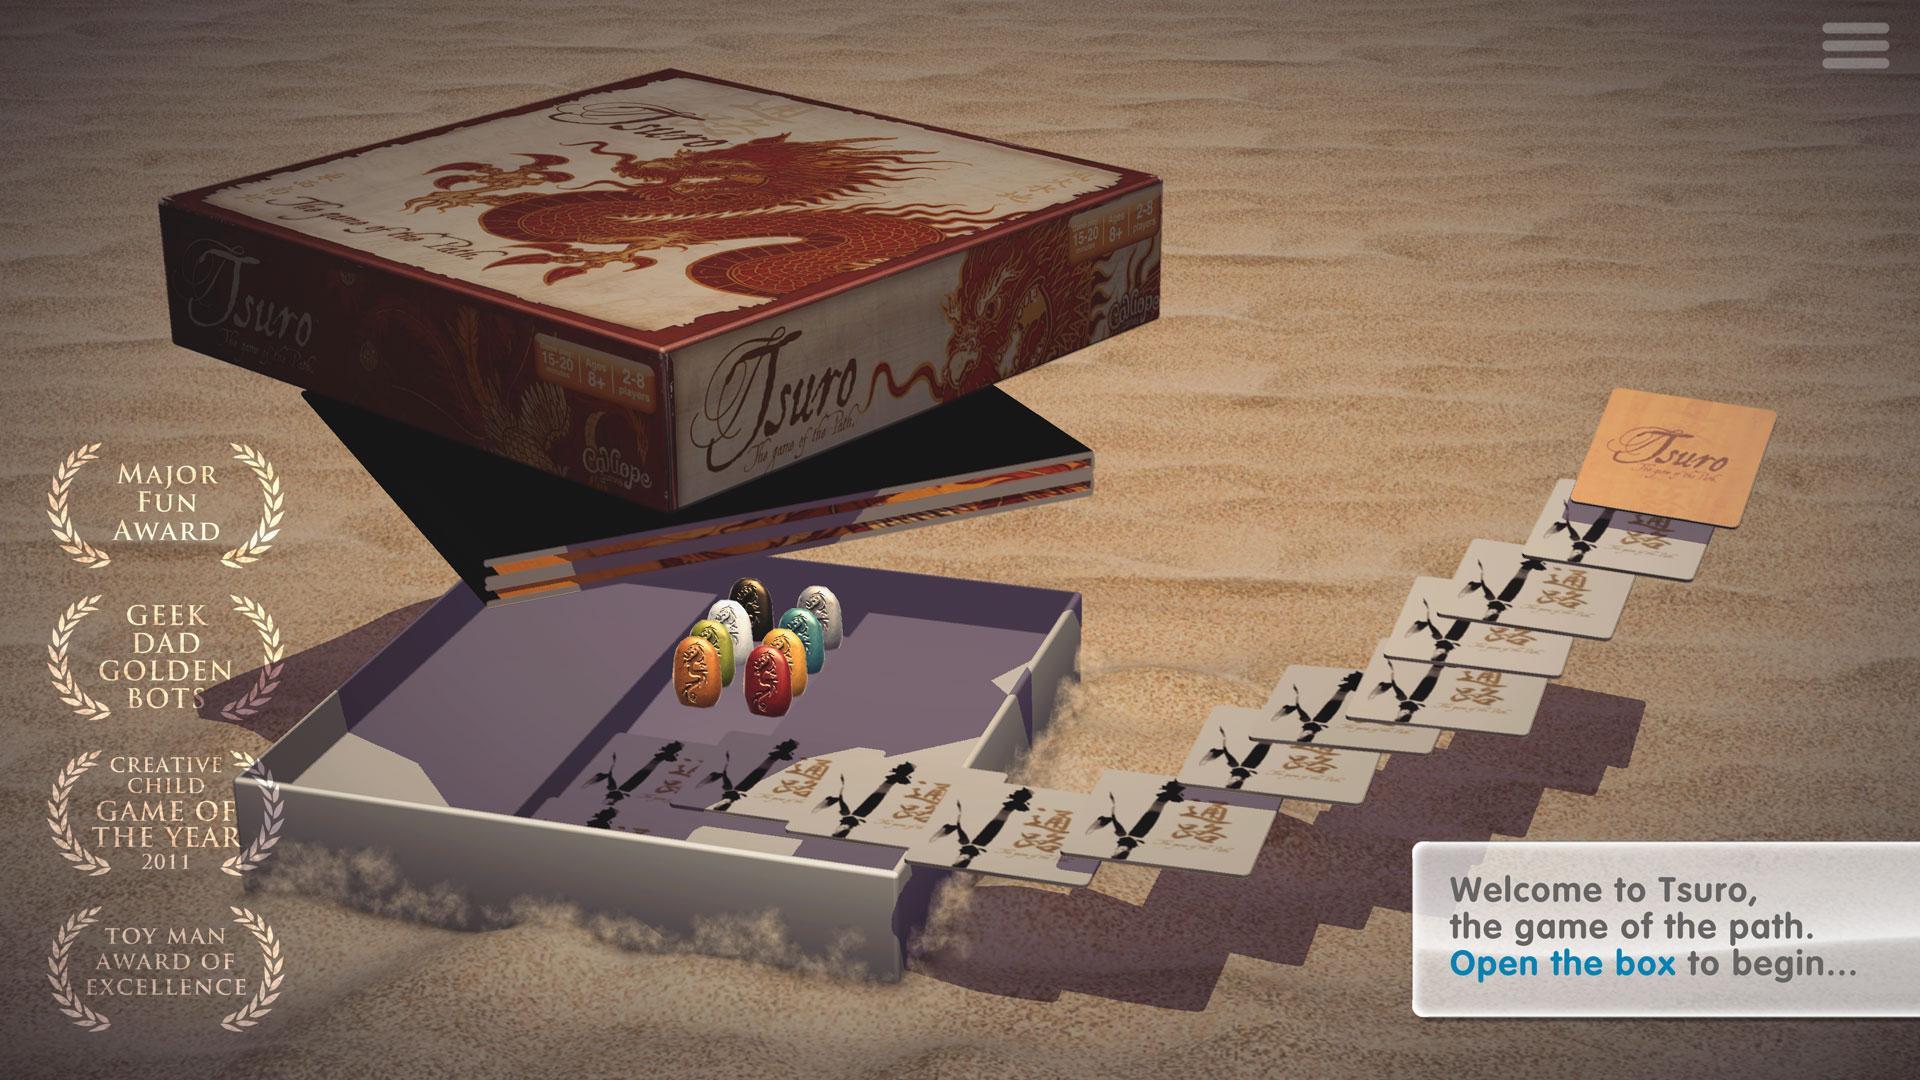 Tsuro - The Game of the Path screenshot #1